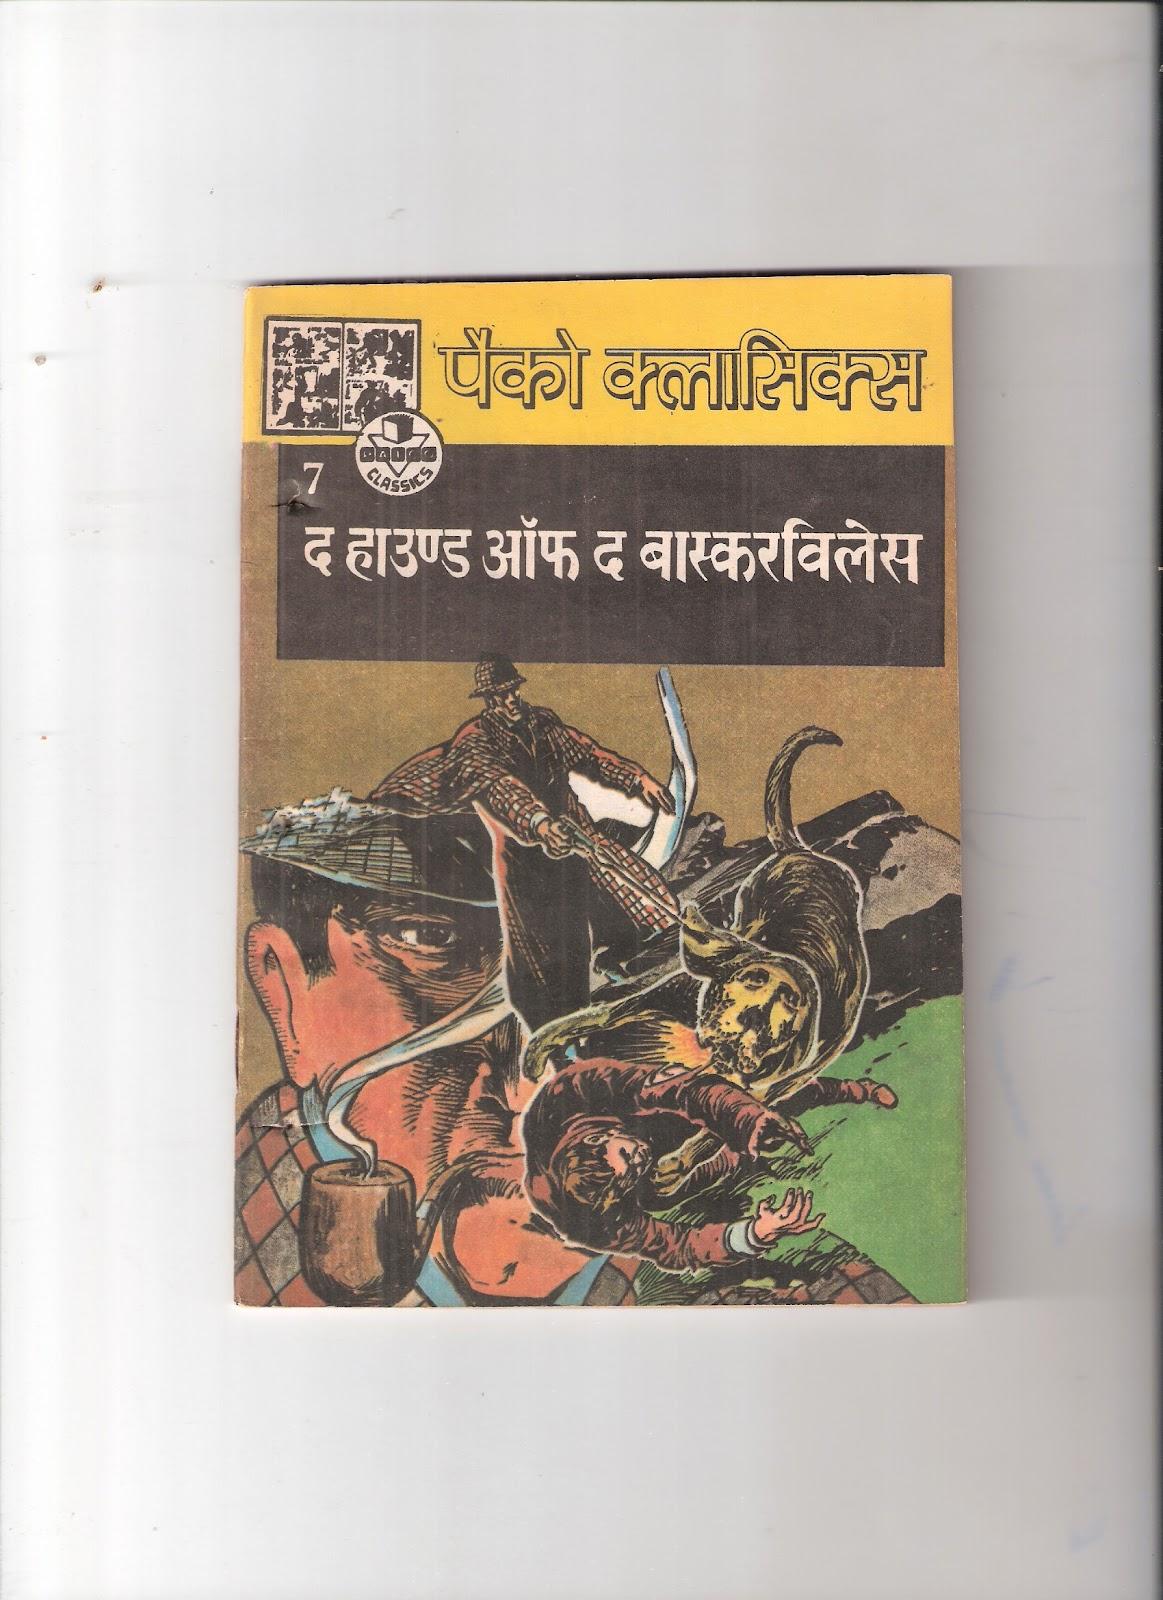 sherlock holmes novels in hindi pdf download